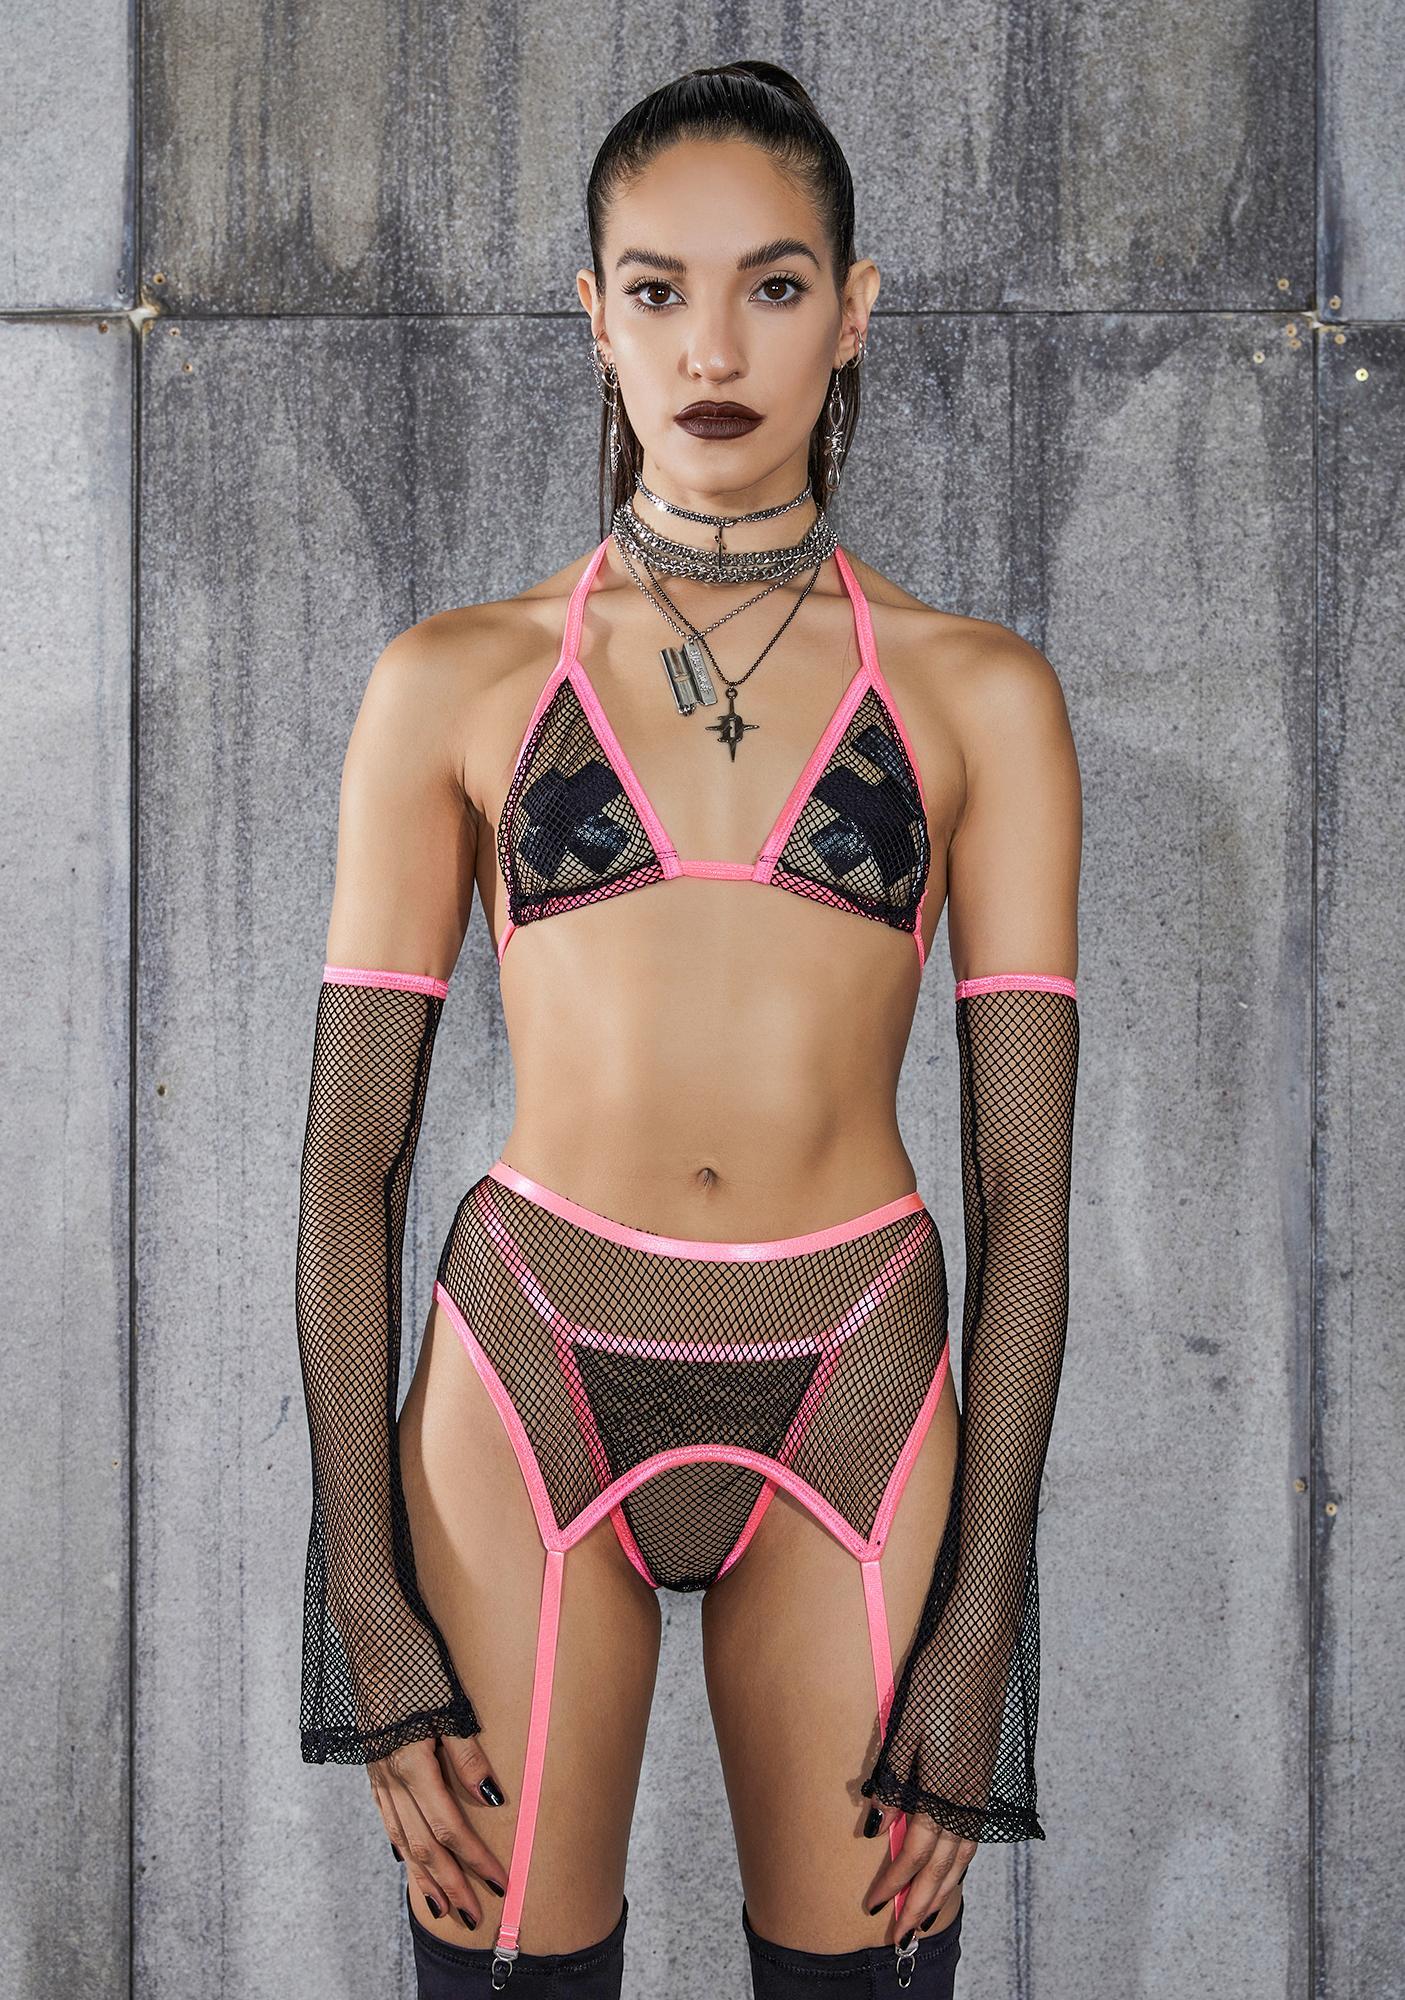 DARKER WAVS Snare Pink Piping Fishnet 4-Piece Garter Set